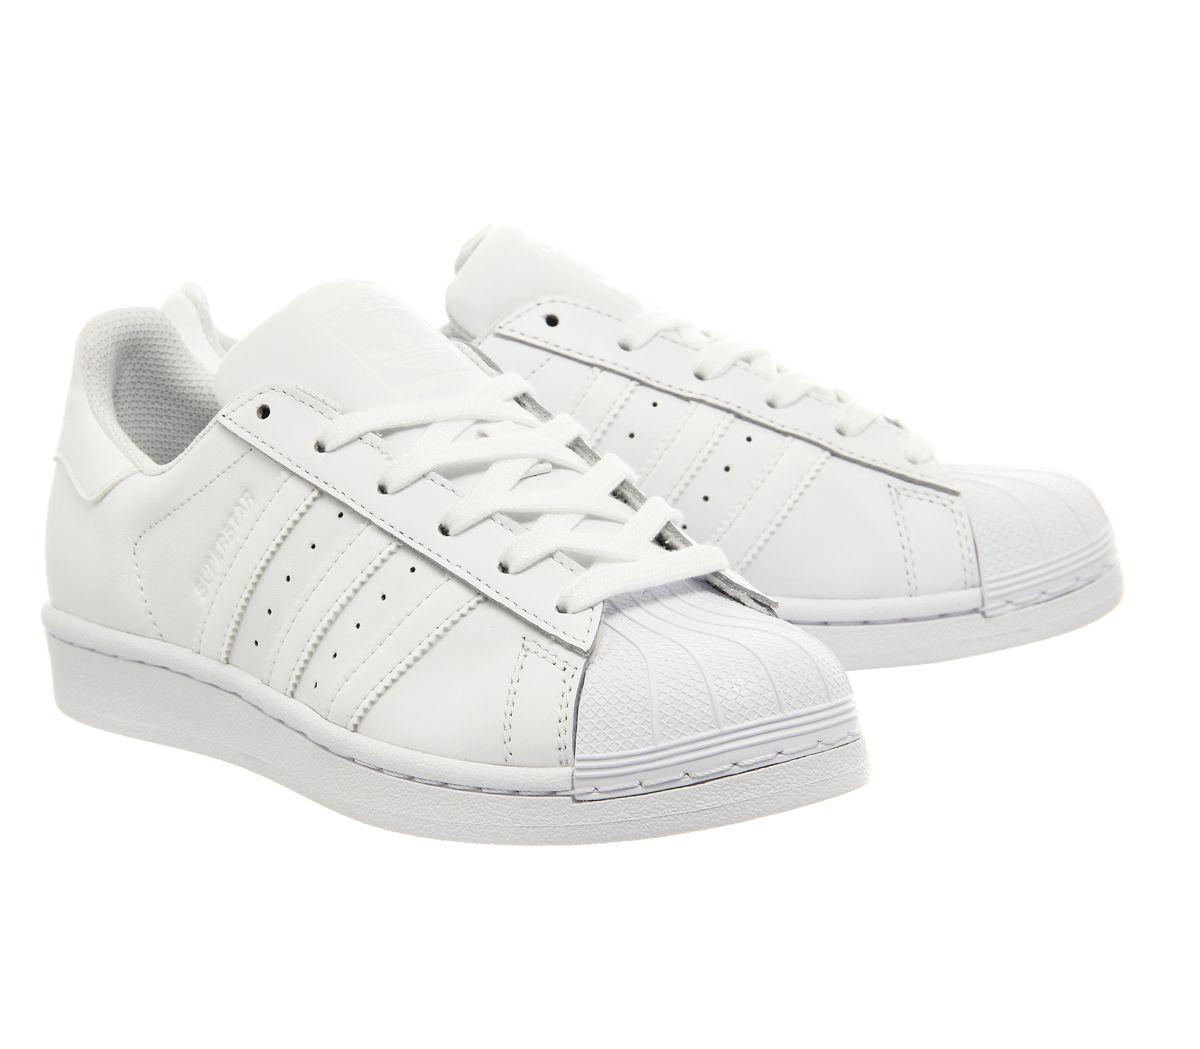 40c2d7426a15ae Adidas Superstar 1 White Mono Foundation - Unisex Sports